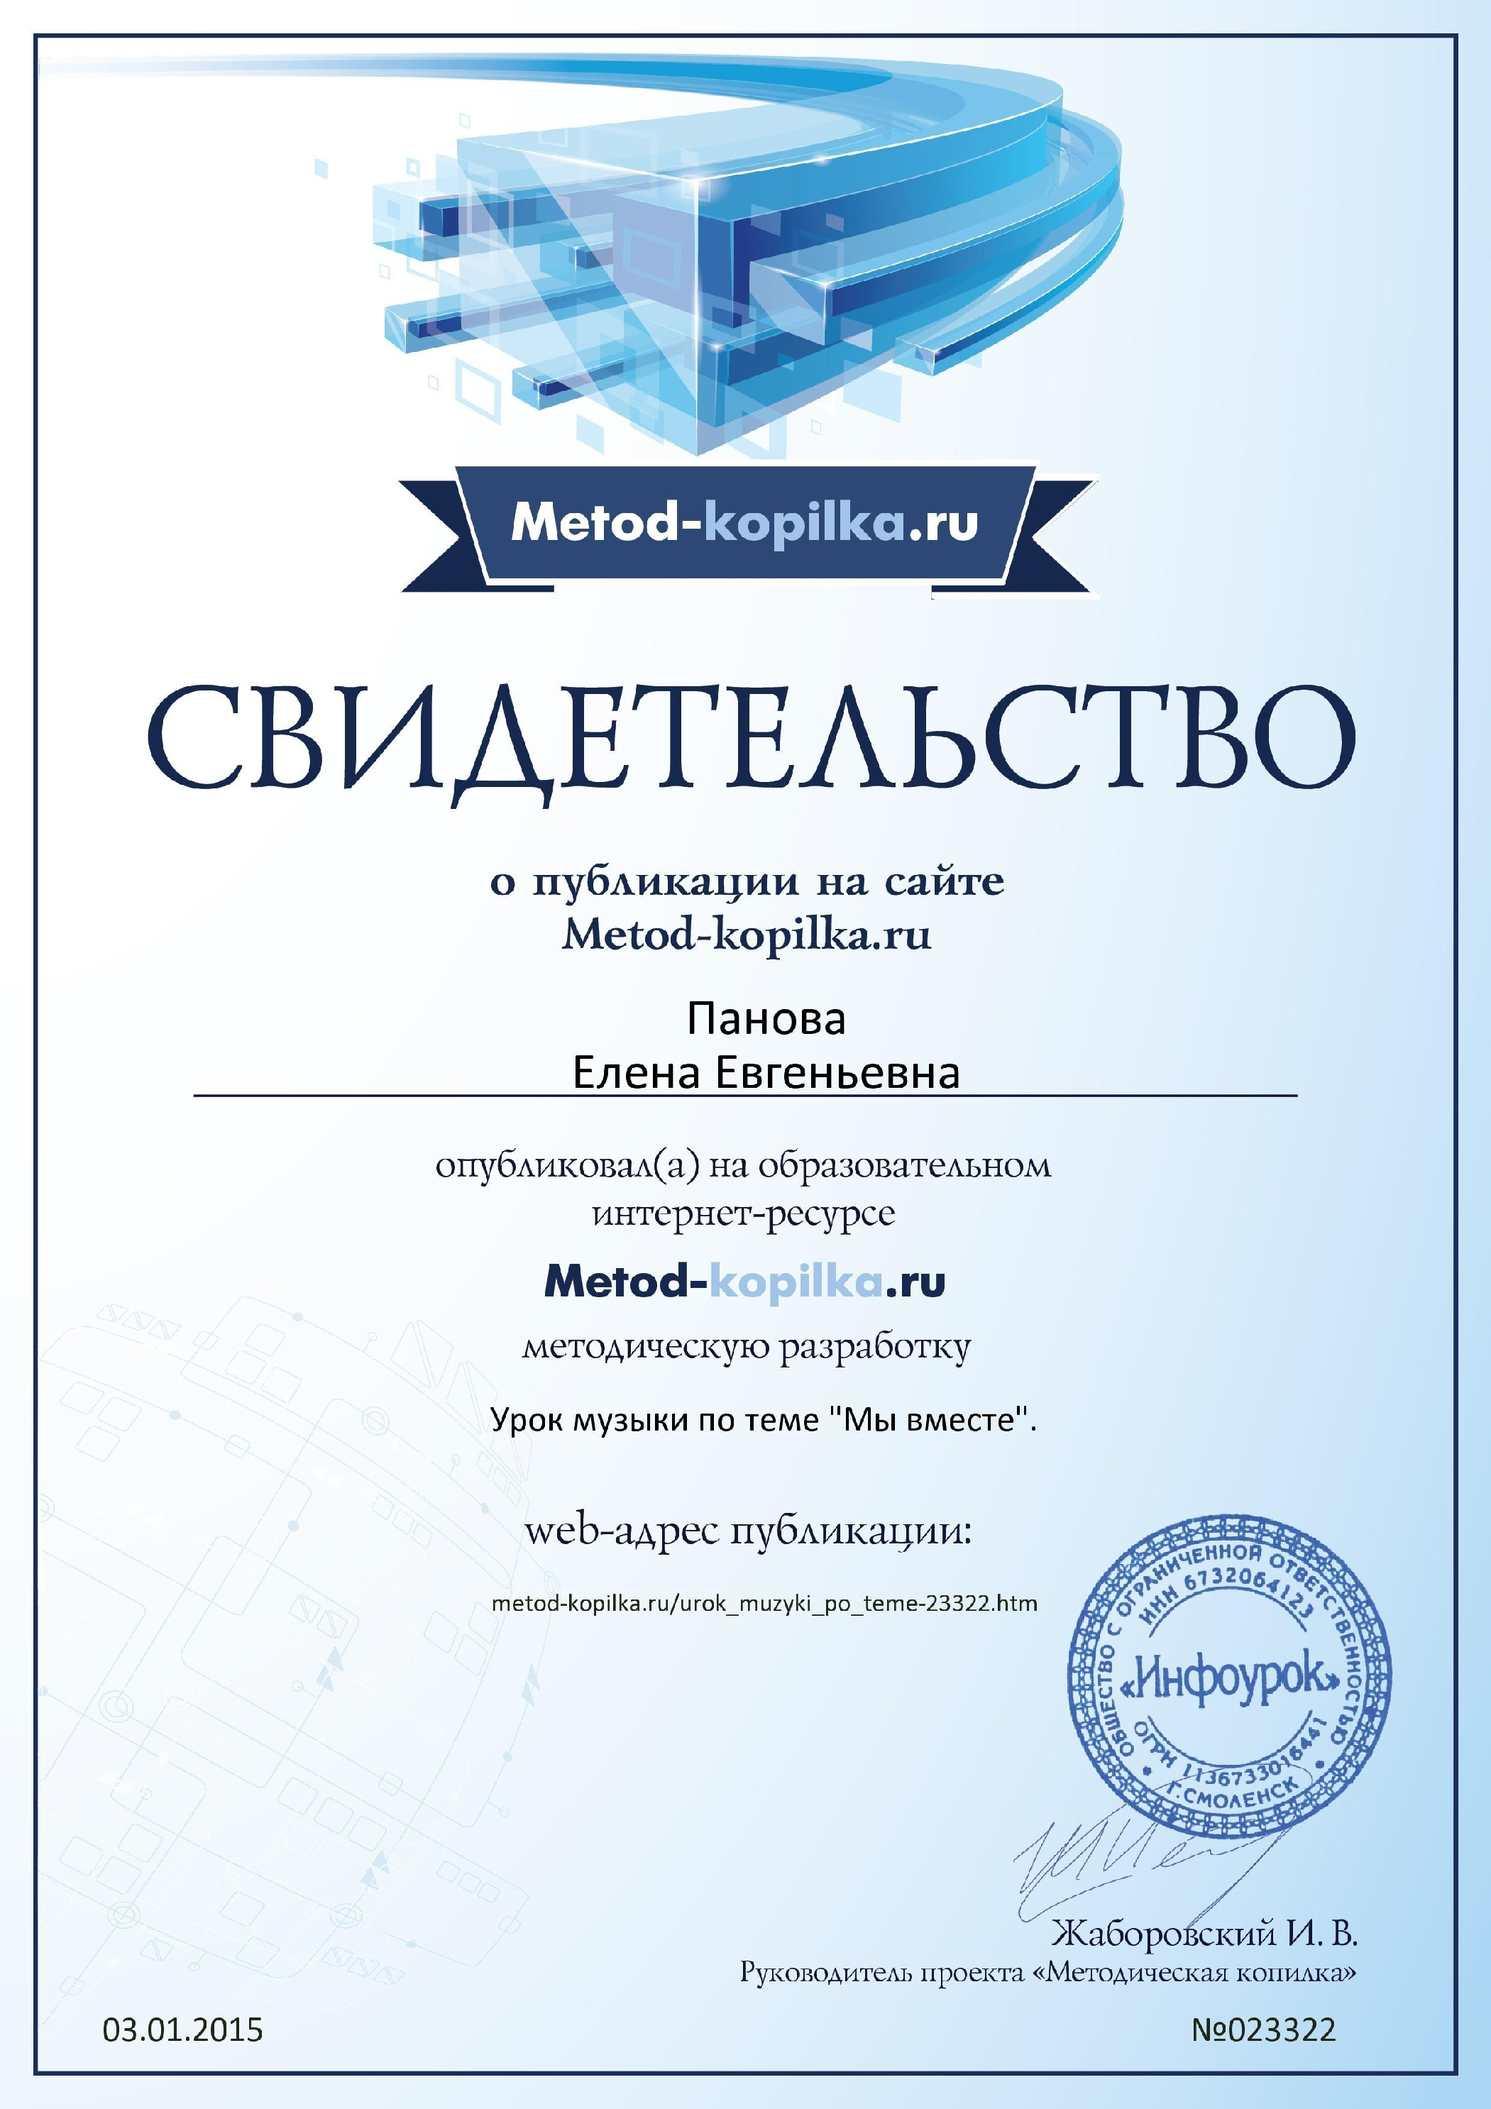 Http www metod kopilka ru nova park 5 кумкой сиде